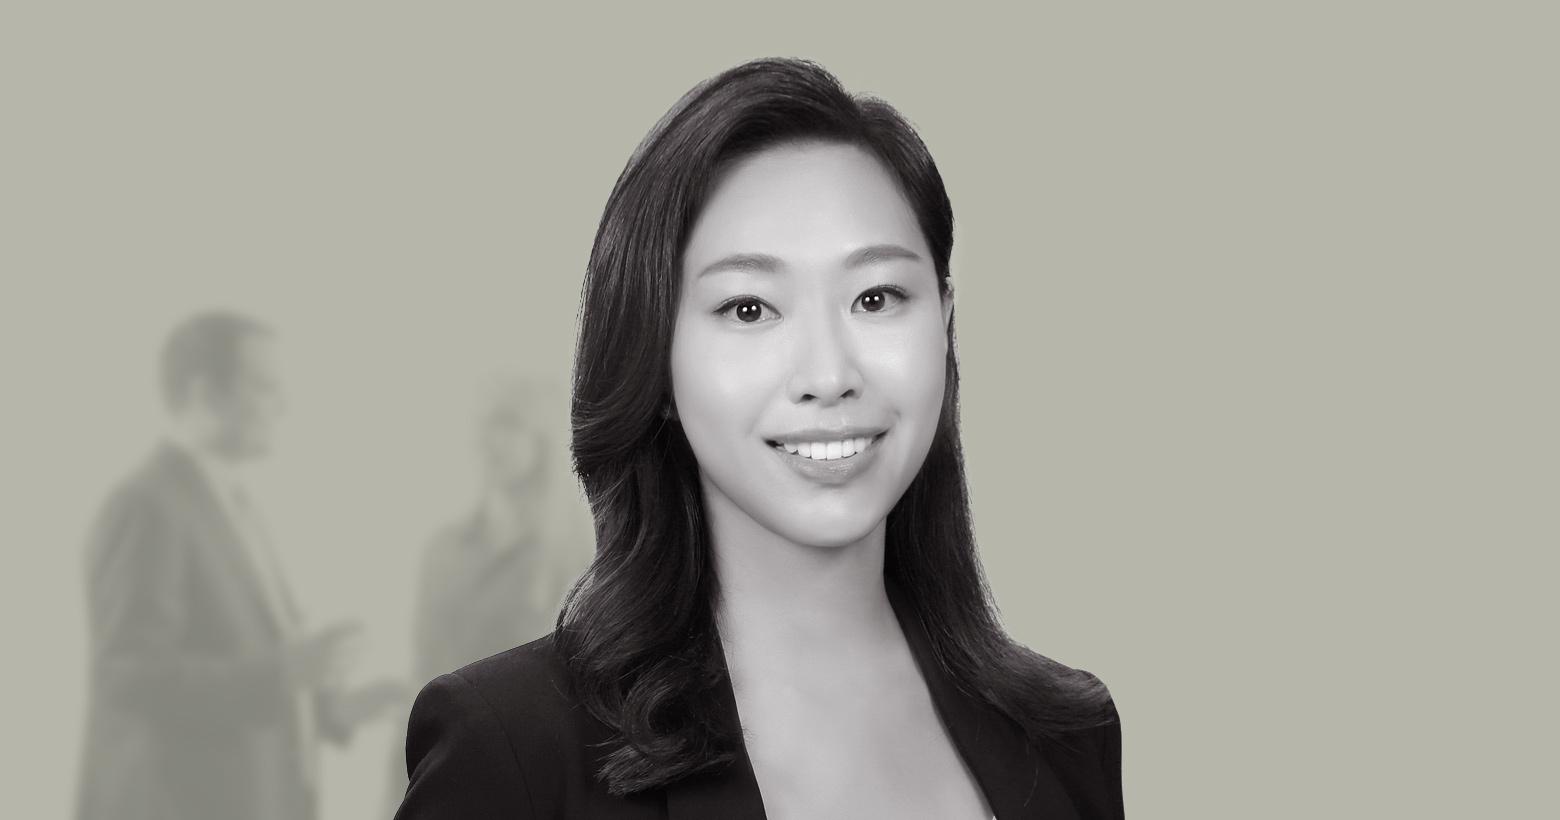 Soo Yeon Jang